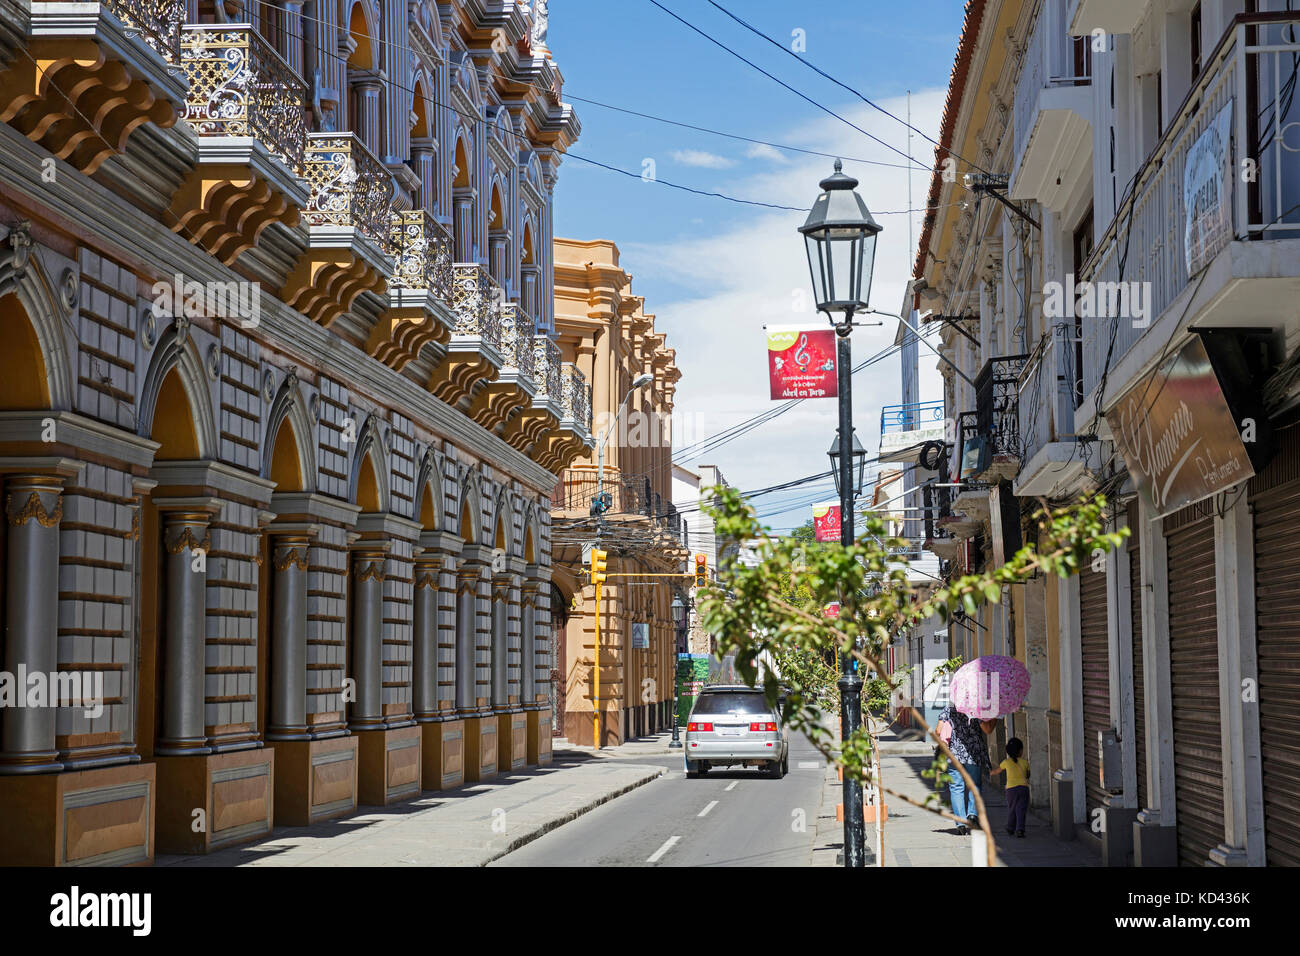 The Gilded House / Casa Dorada, museum in the city Tarija, Cercado, southern Bolivia - Stock Image